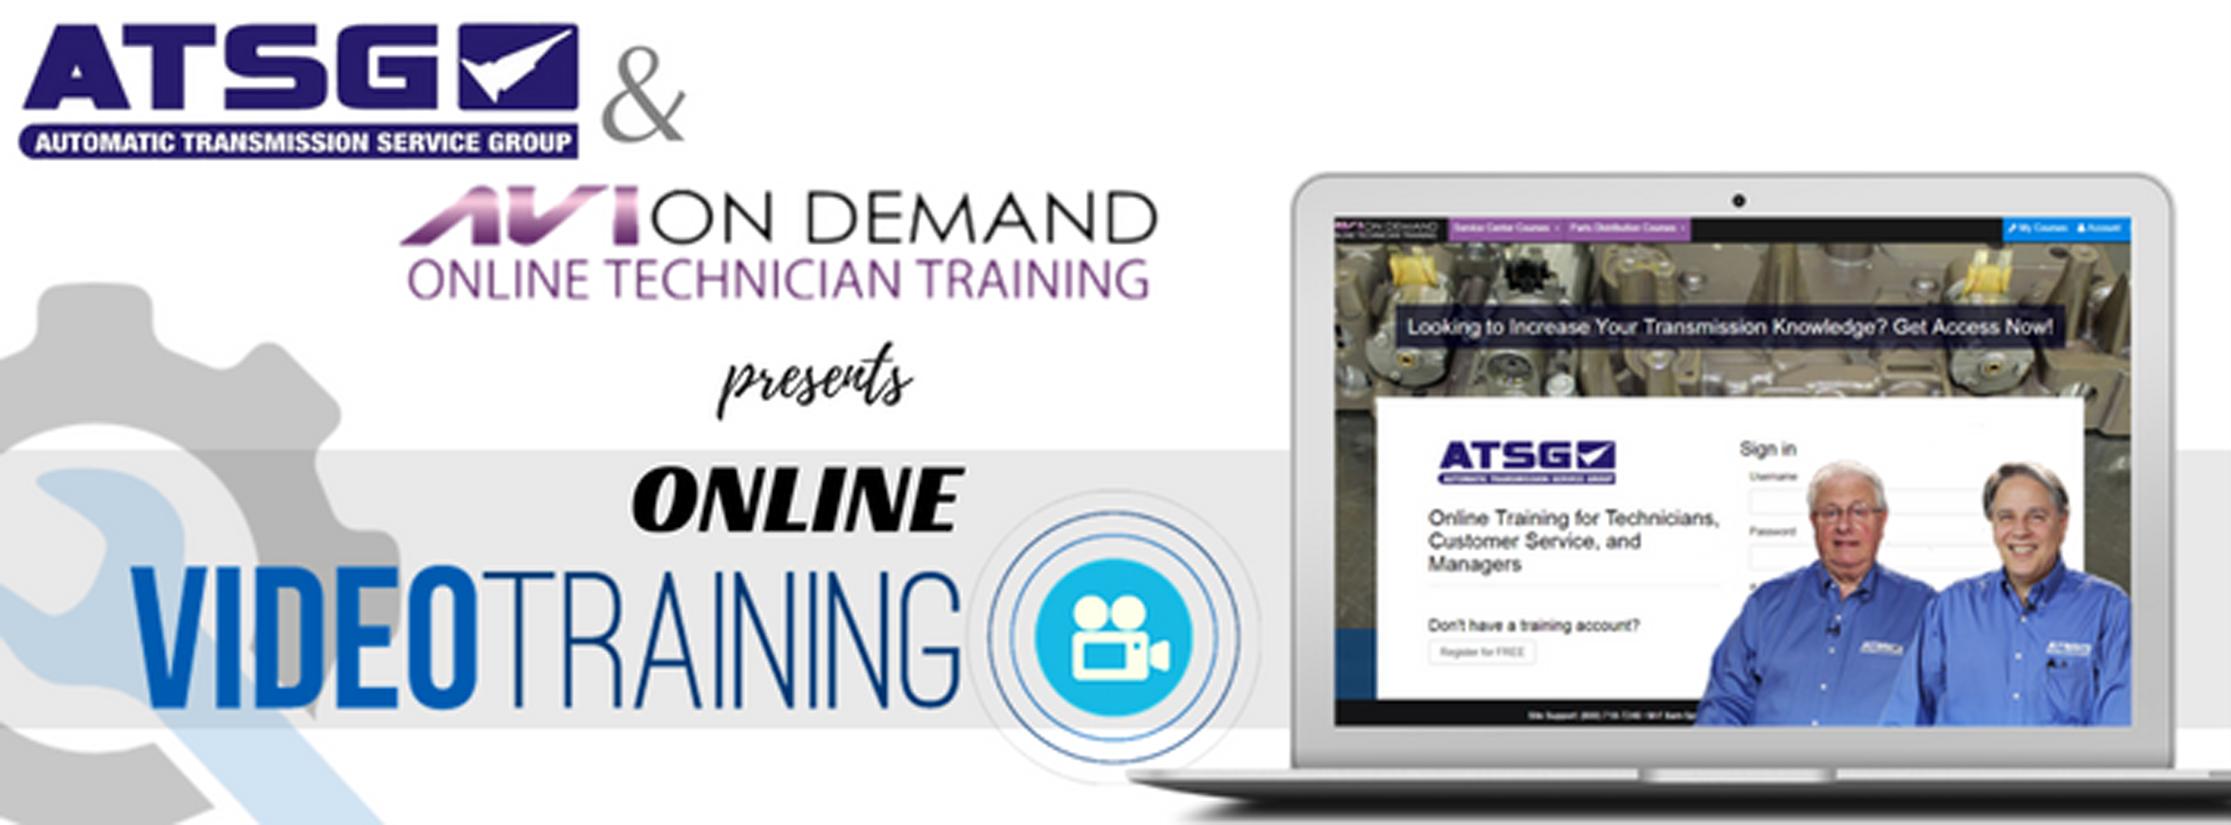 ATSG & AVI Video Training Series